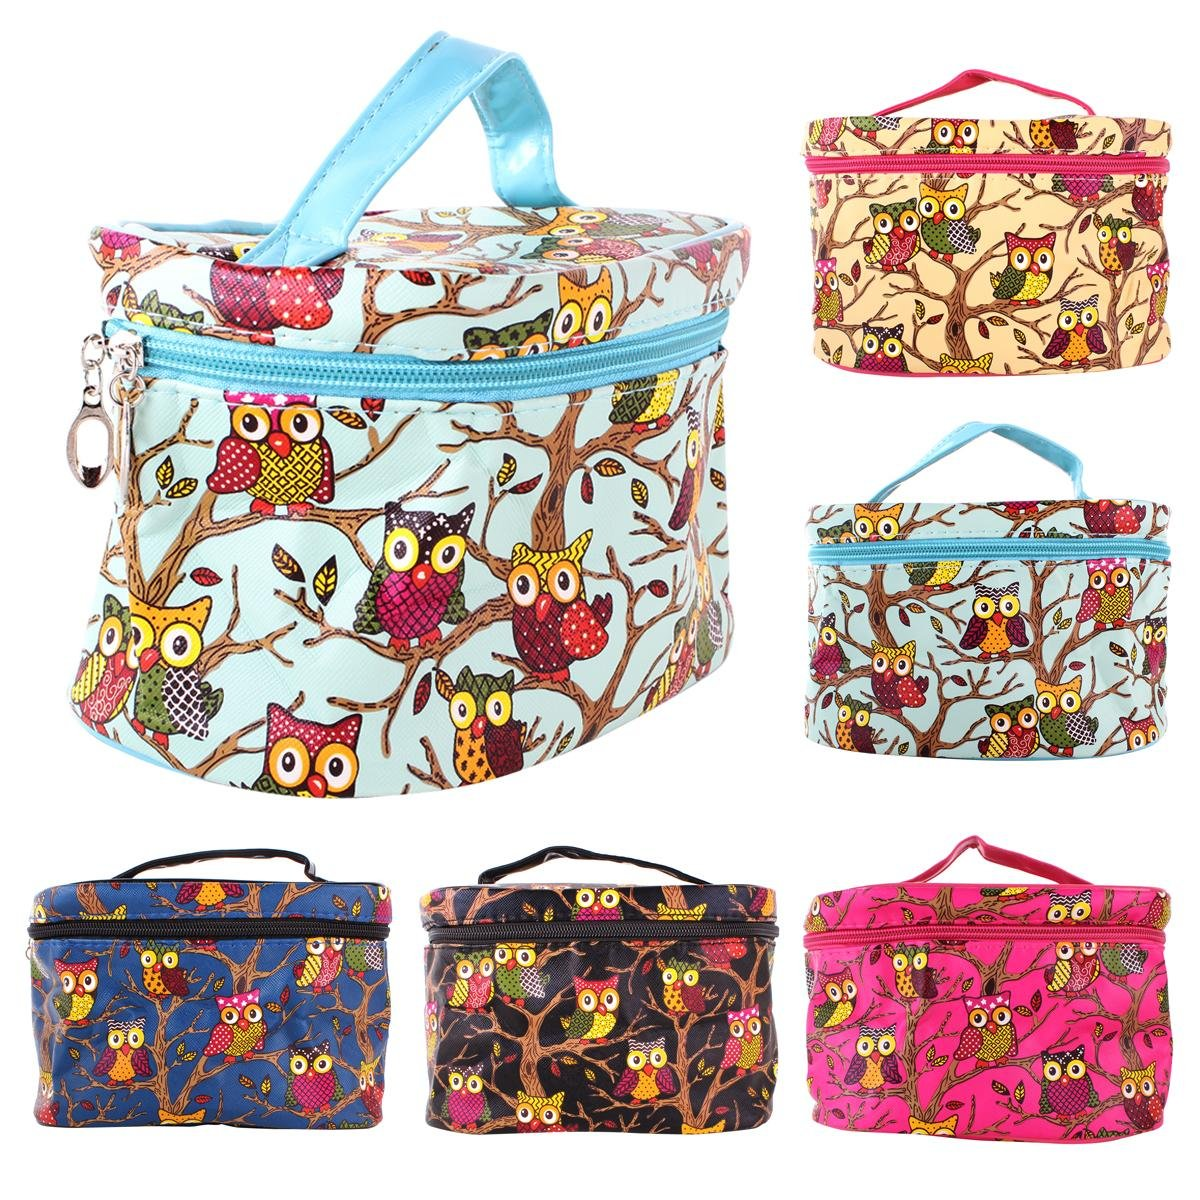 8c684772eb YESURPRISE Ladies Owl Pattern Cosmetic Makeup Bag Case Travel Toiletry Wash  Hand Beauty Bag Black Fashion Gift  Amazon.co.uk  Beauty